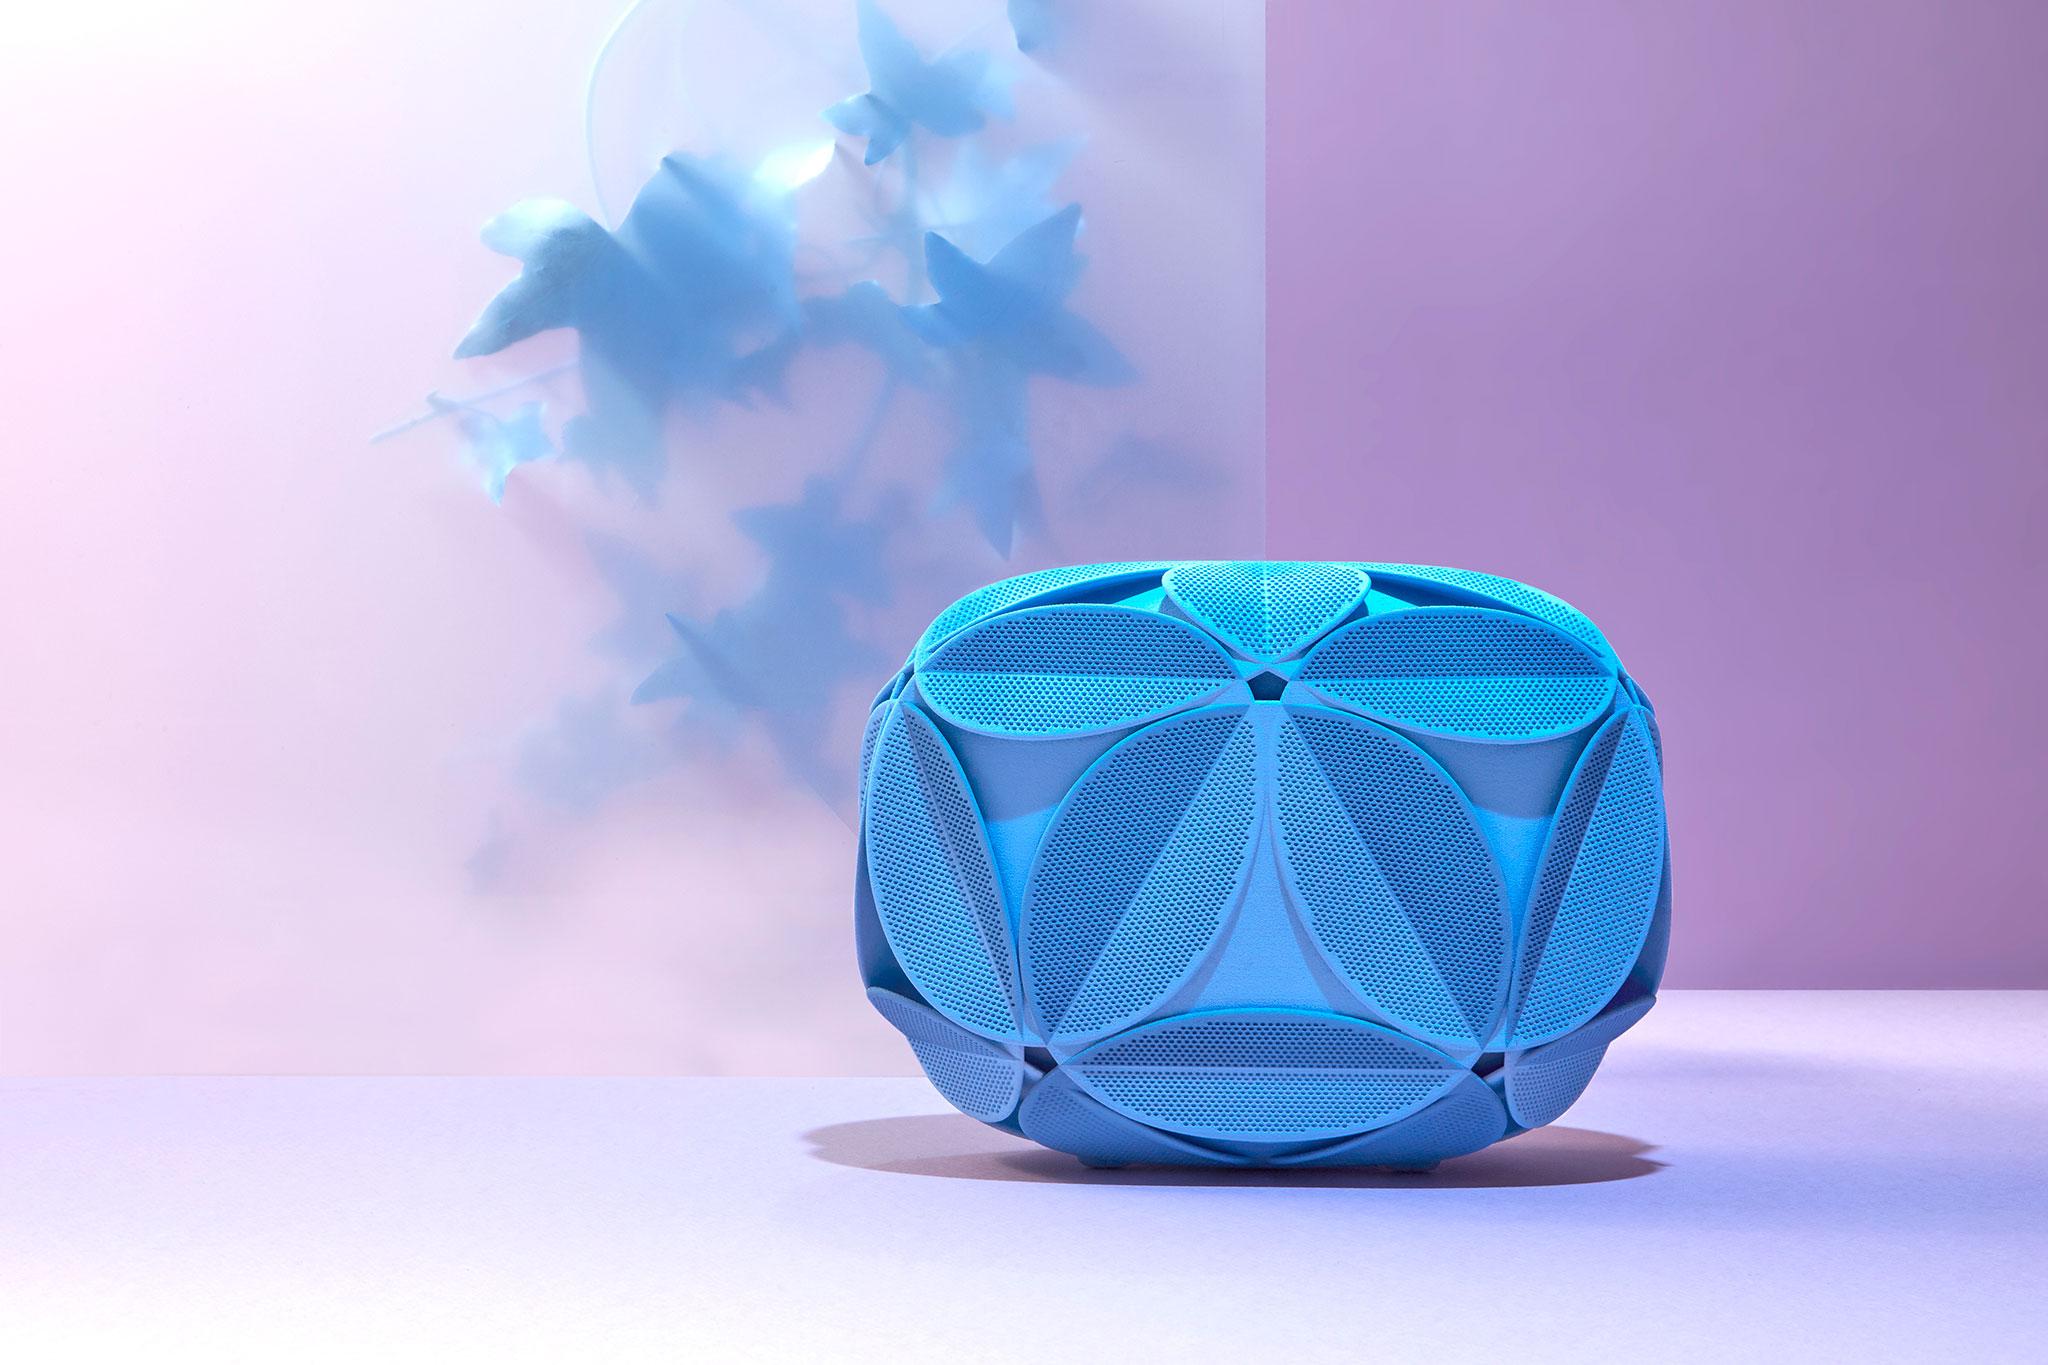 Ivy-3D-Printed-Clutch-Maison-203-01